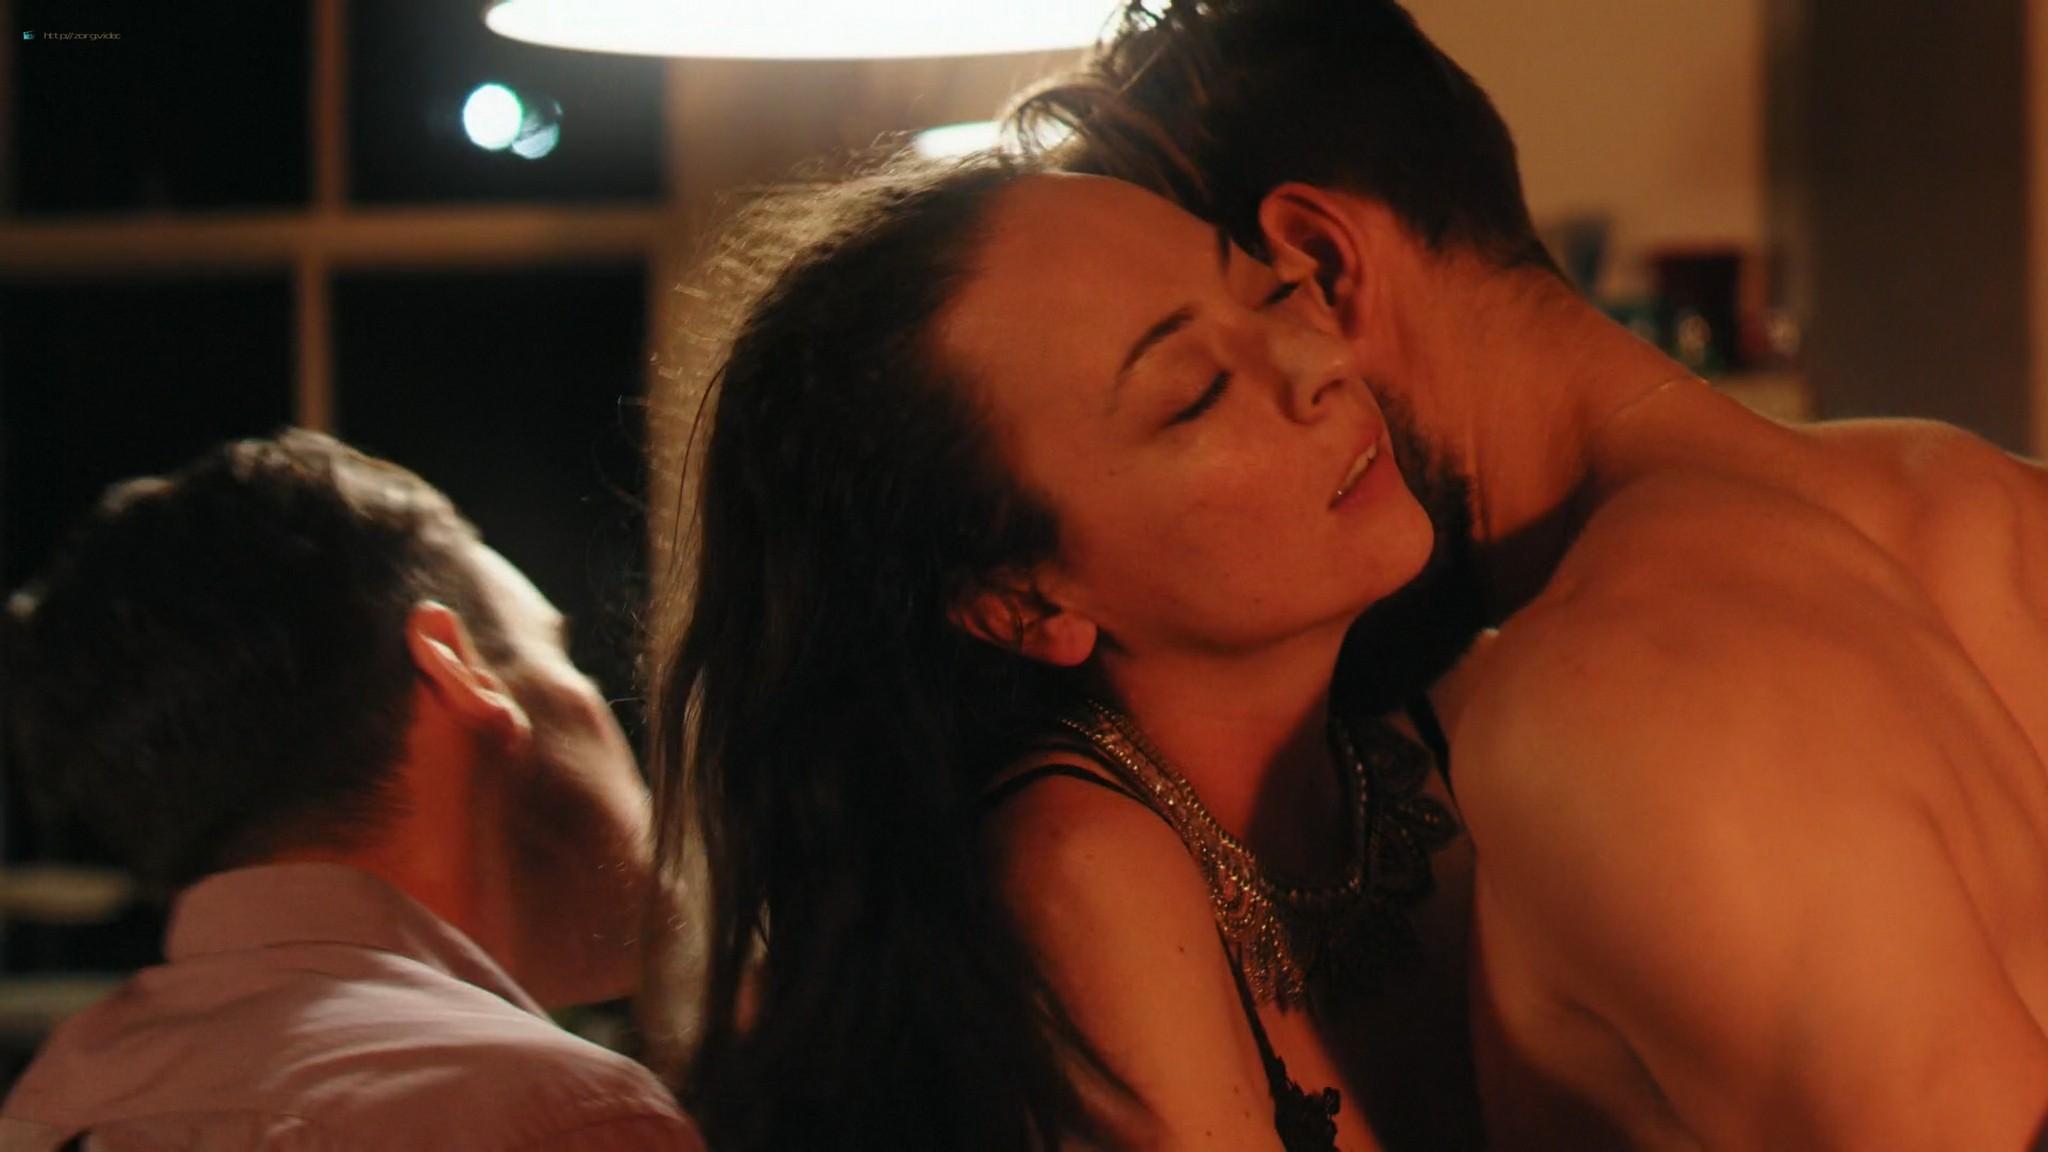 Keely Cat Wells nude Claudine-Helene Aumord full-frontal - Dirty Work (2018) HD 1080p Web (7)